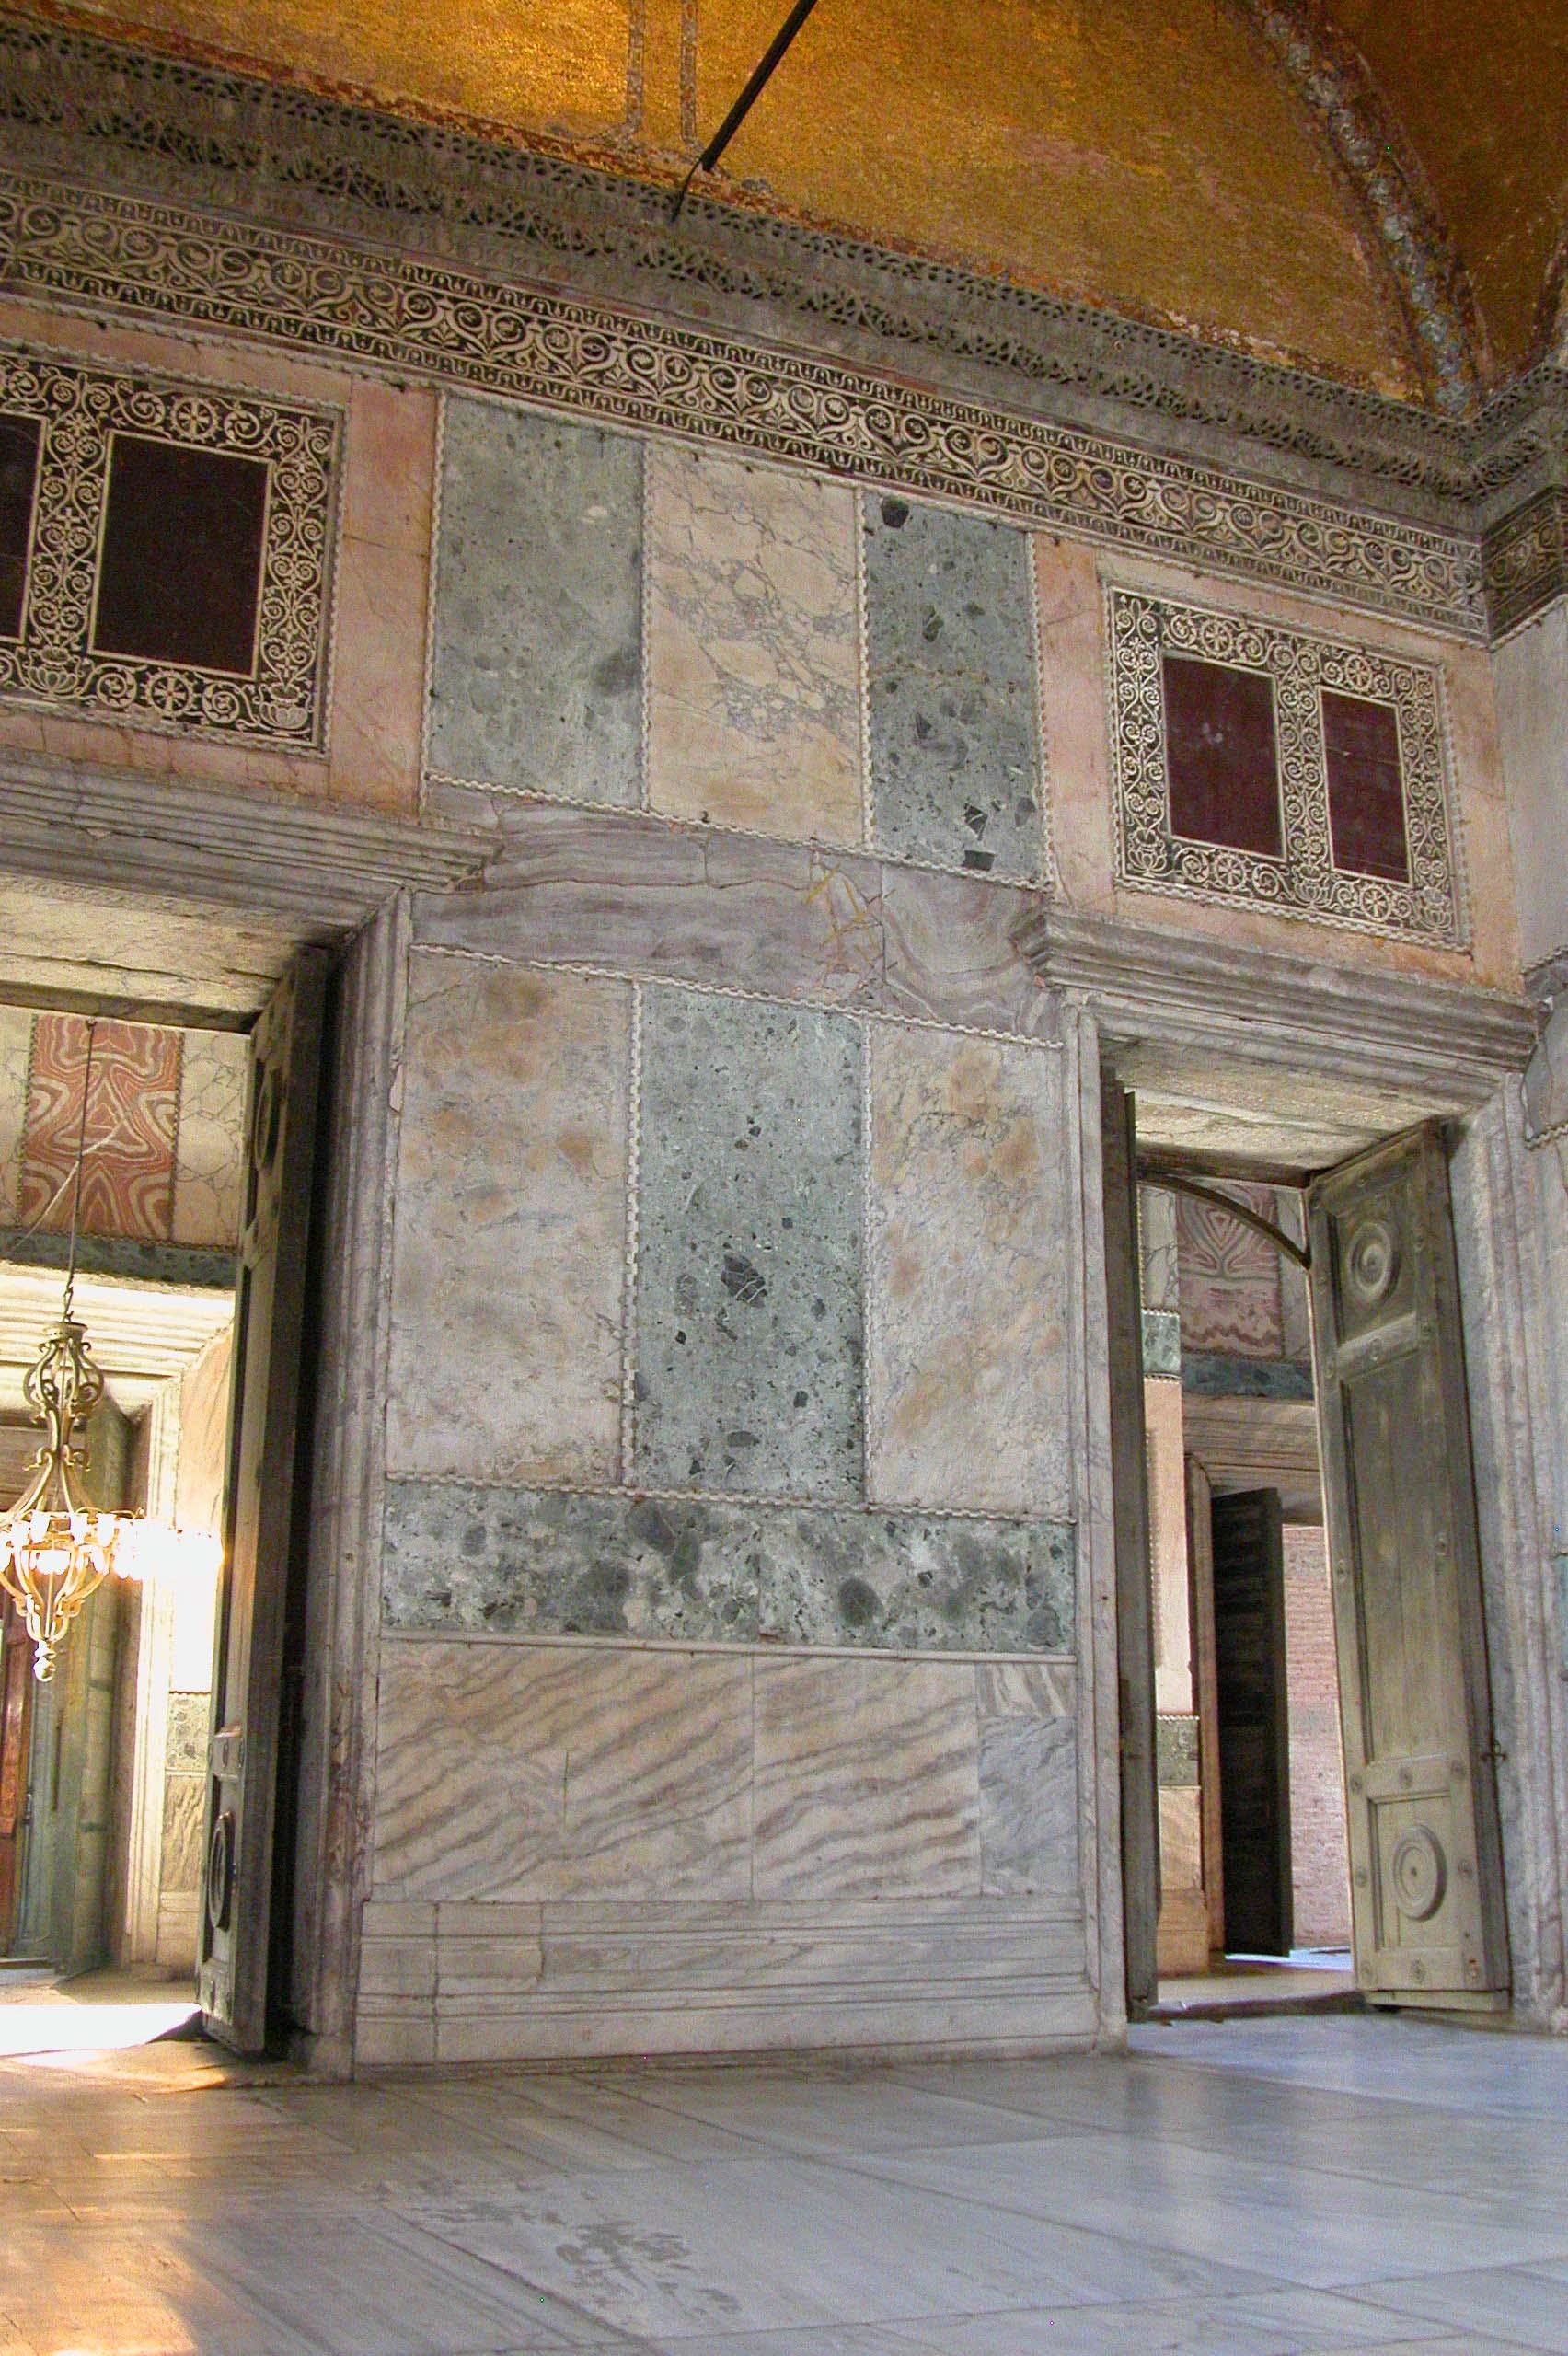 Marble Panel in Hagia Sophia